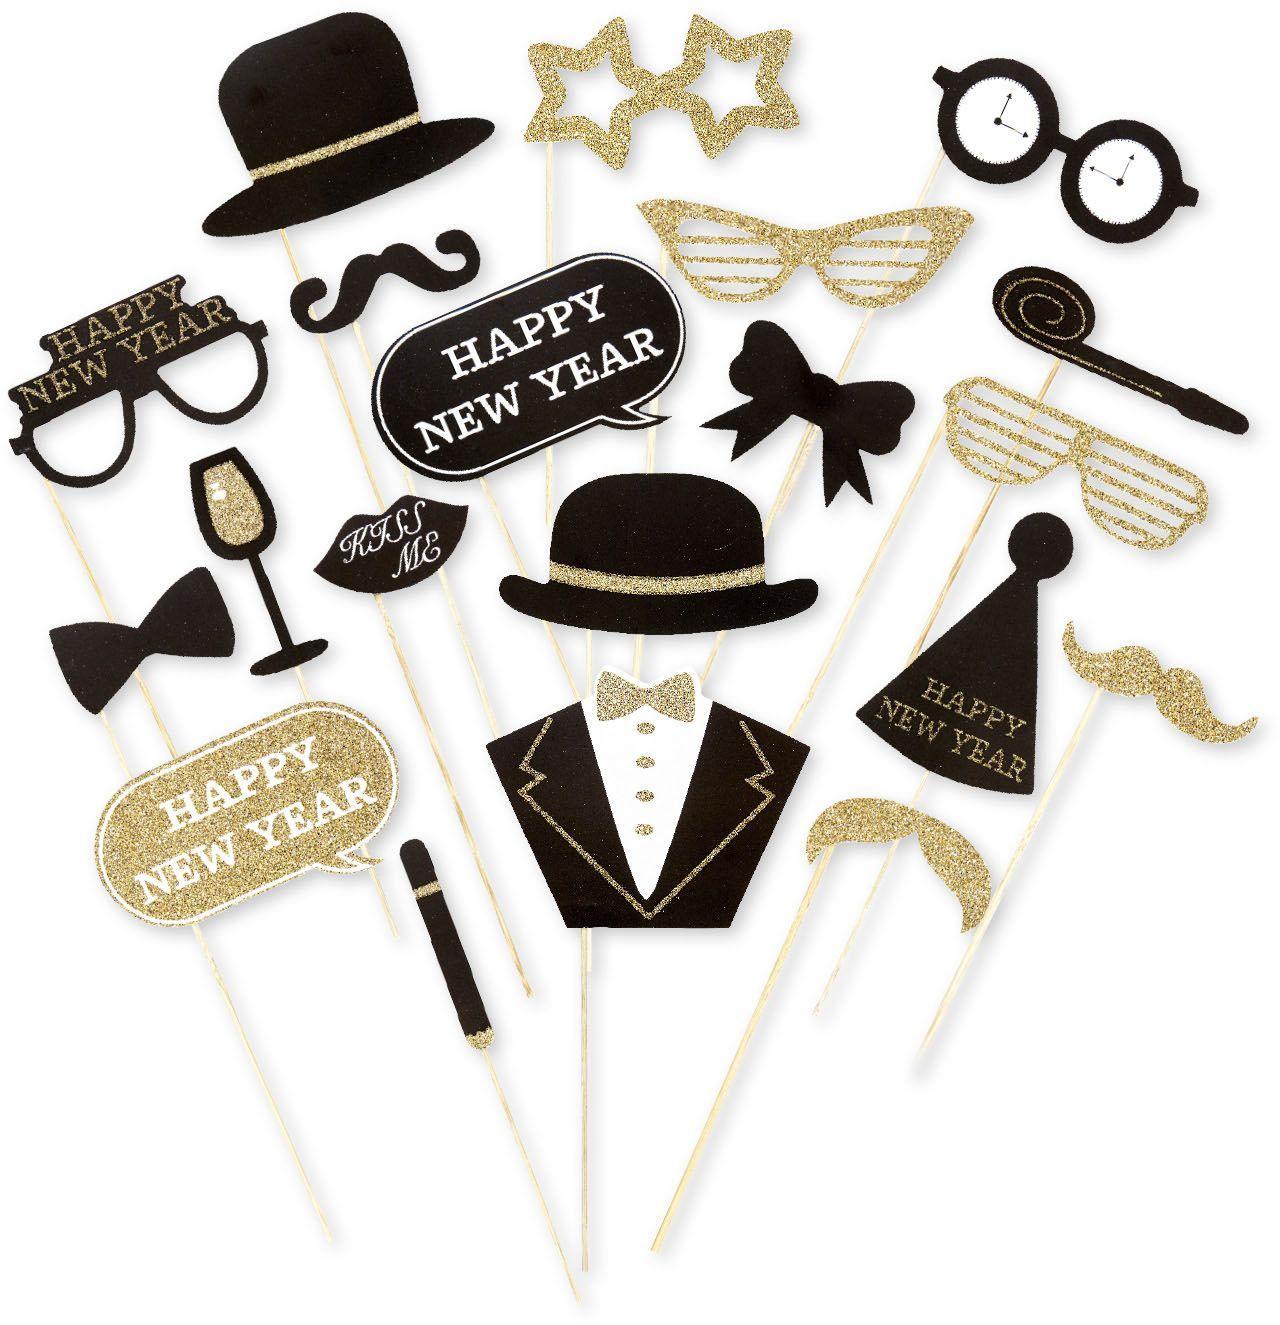 Nieuwjaarsavond foto accessoires